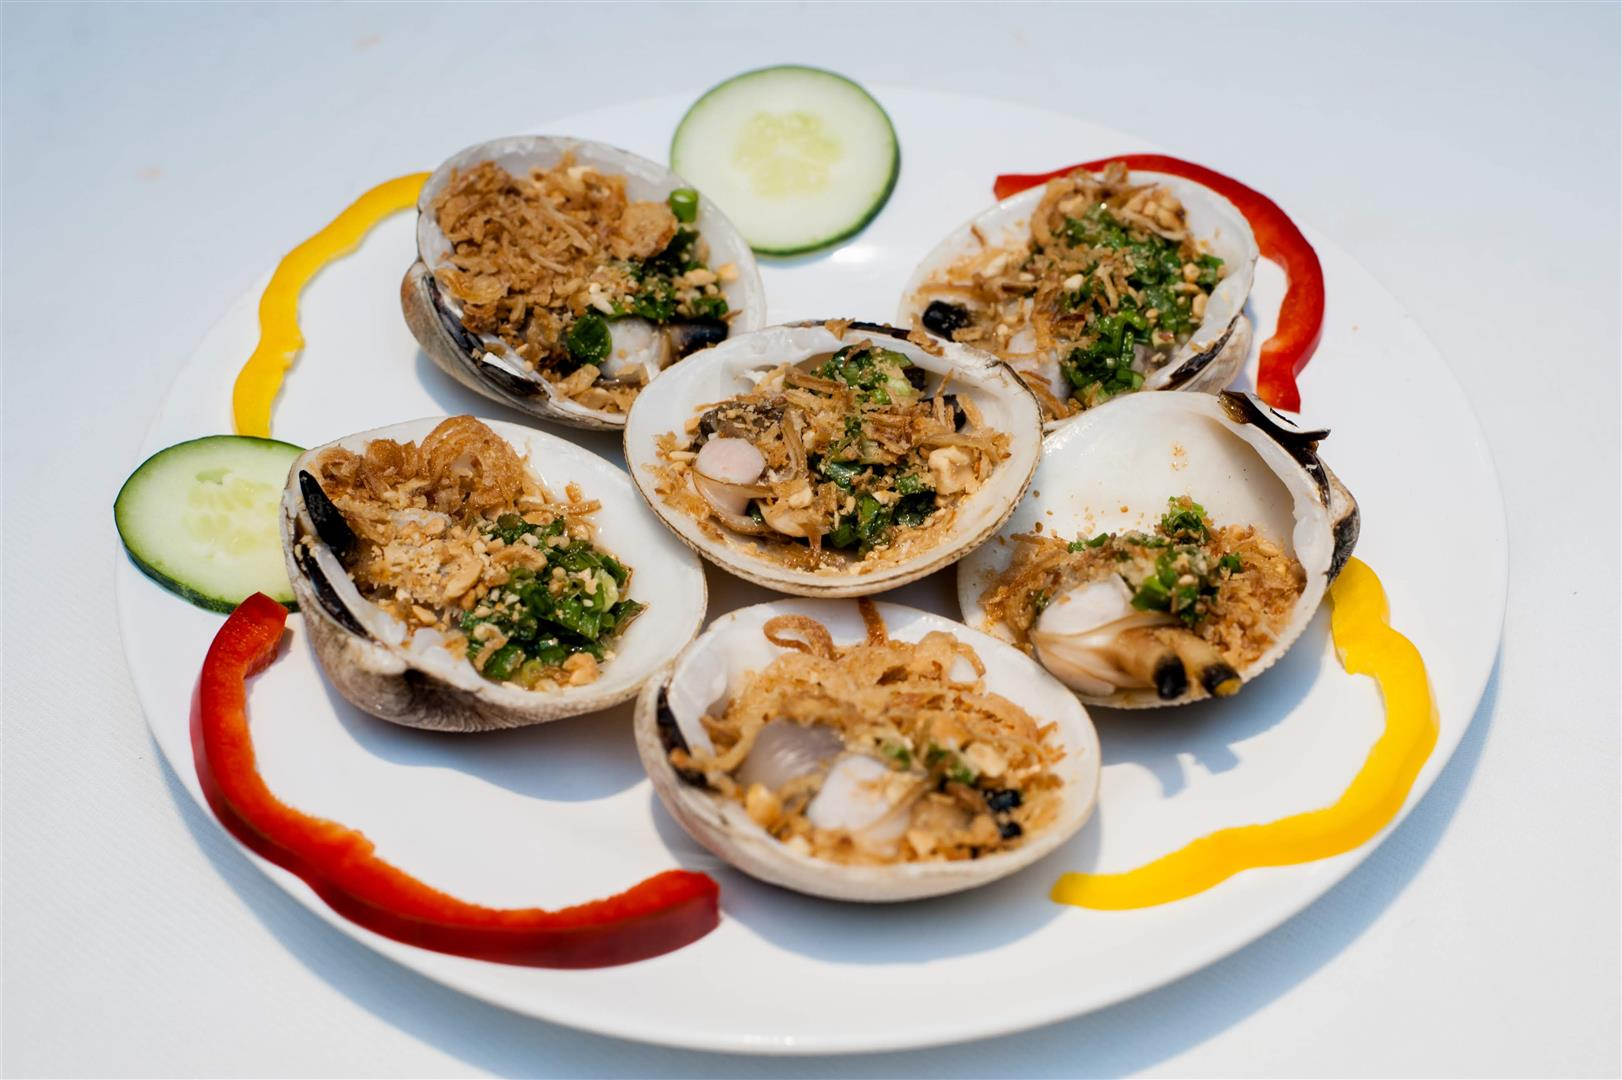 Sò Bung Nướng Mỡ Hành/ Seashell Grilled with onion and oil